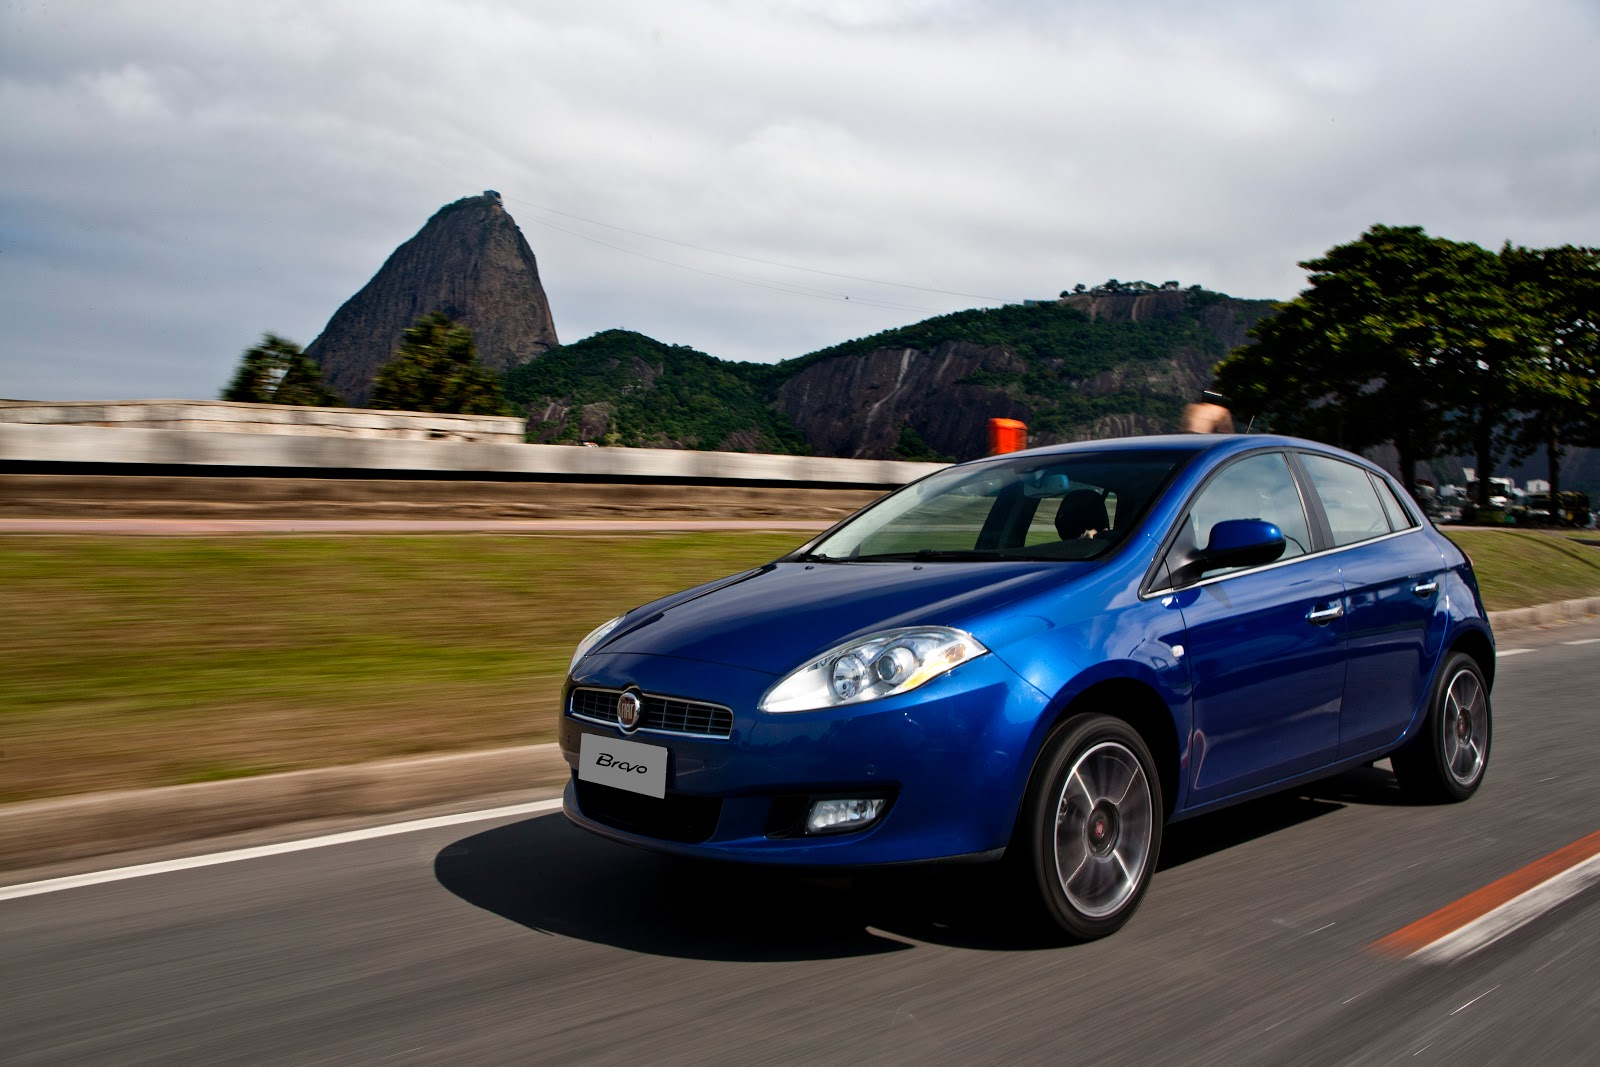 Fiat Bravo - Carboni Fiat de Videira apresenta nesta quinta (13). bravo absolute075